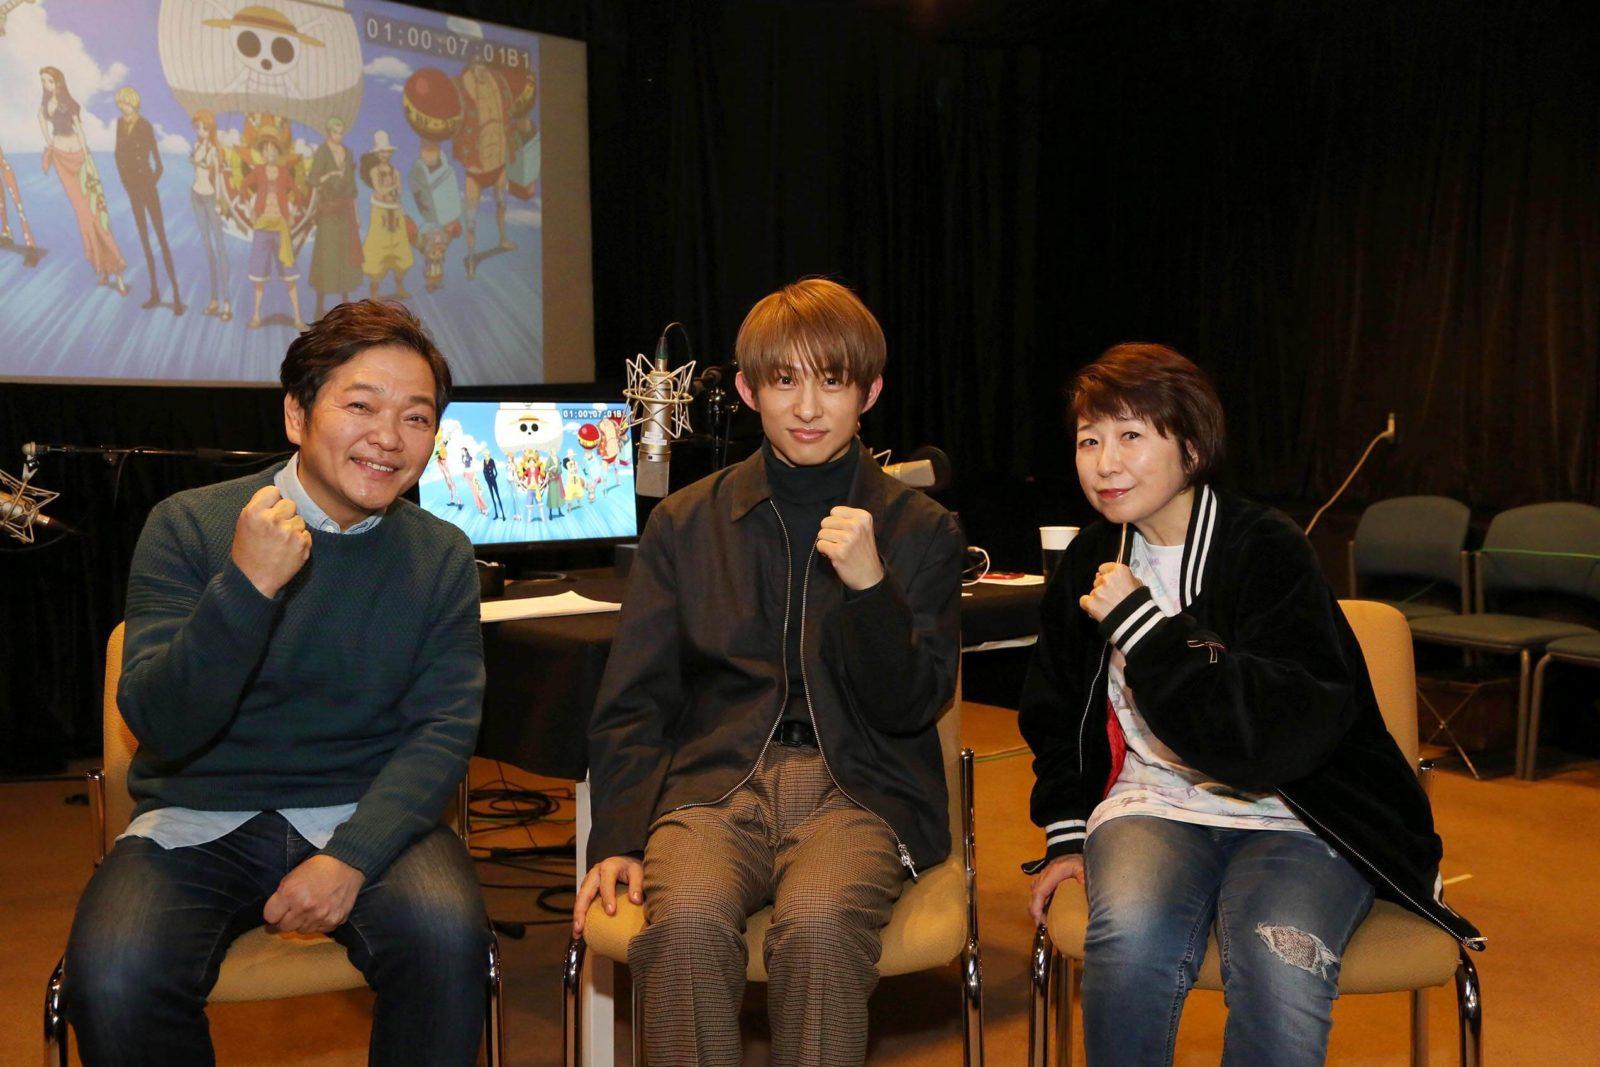 V6 三宅健がワンピース史上初の副音声に挑戦! さらにアニメ声優にも初挑戦で、本編に出演サムネイル画像